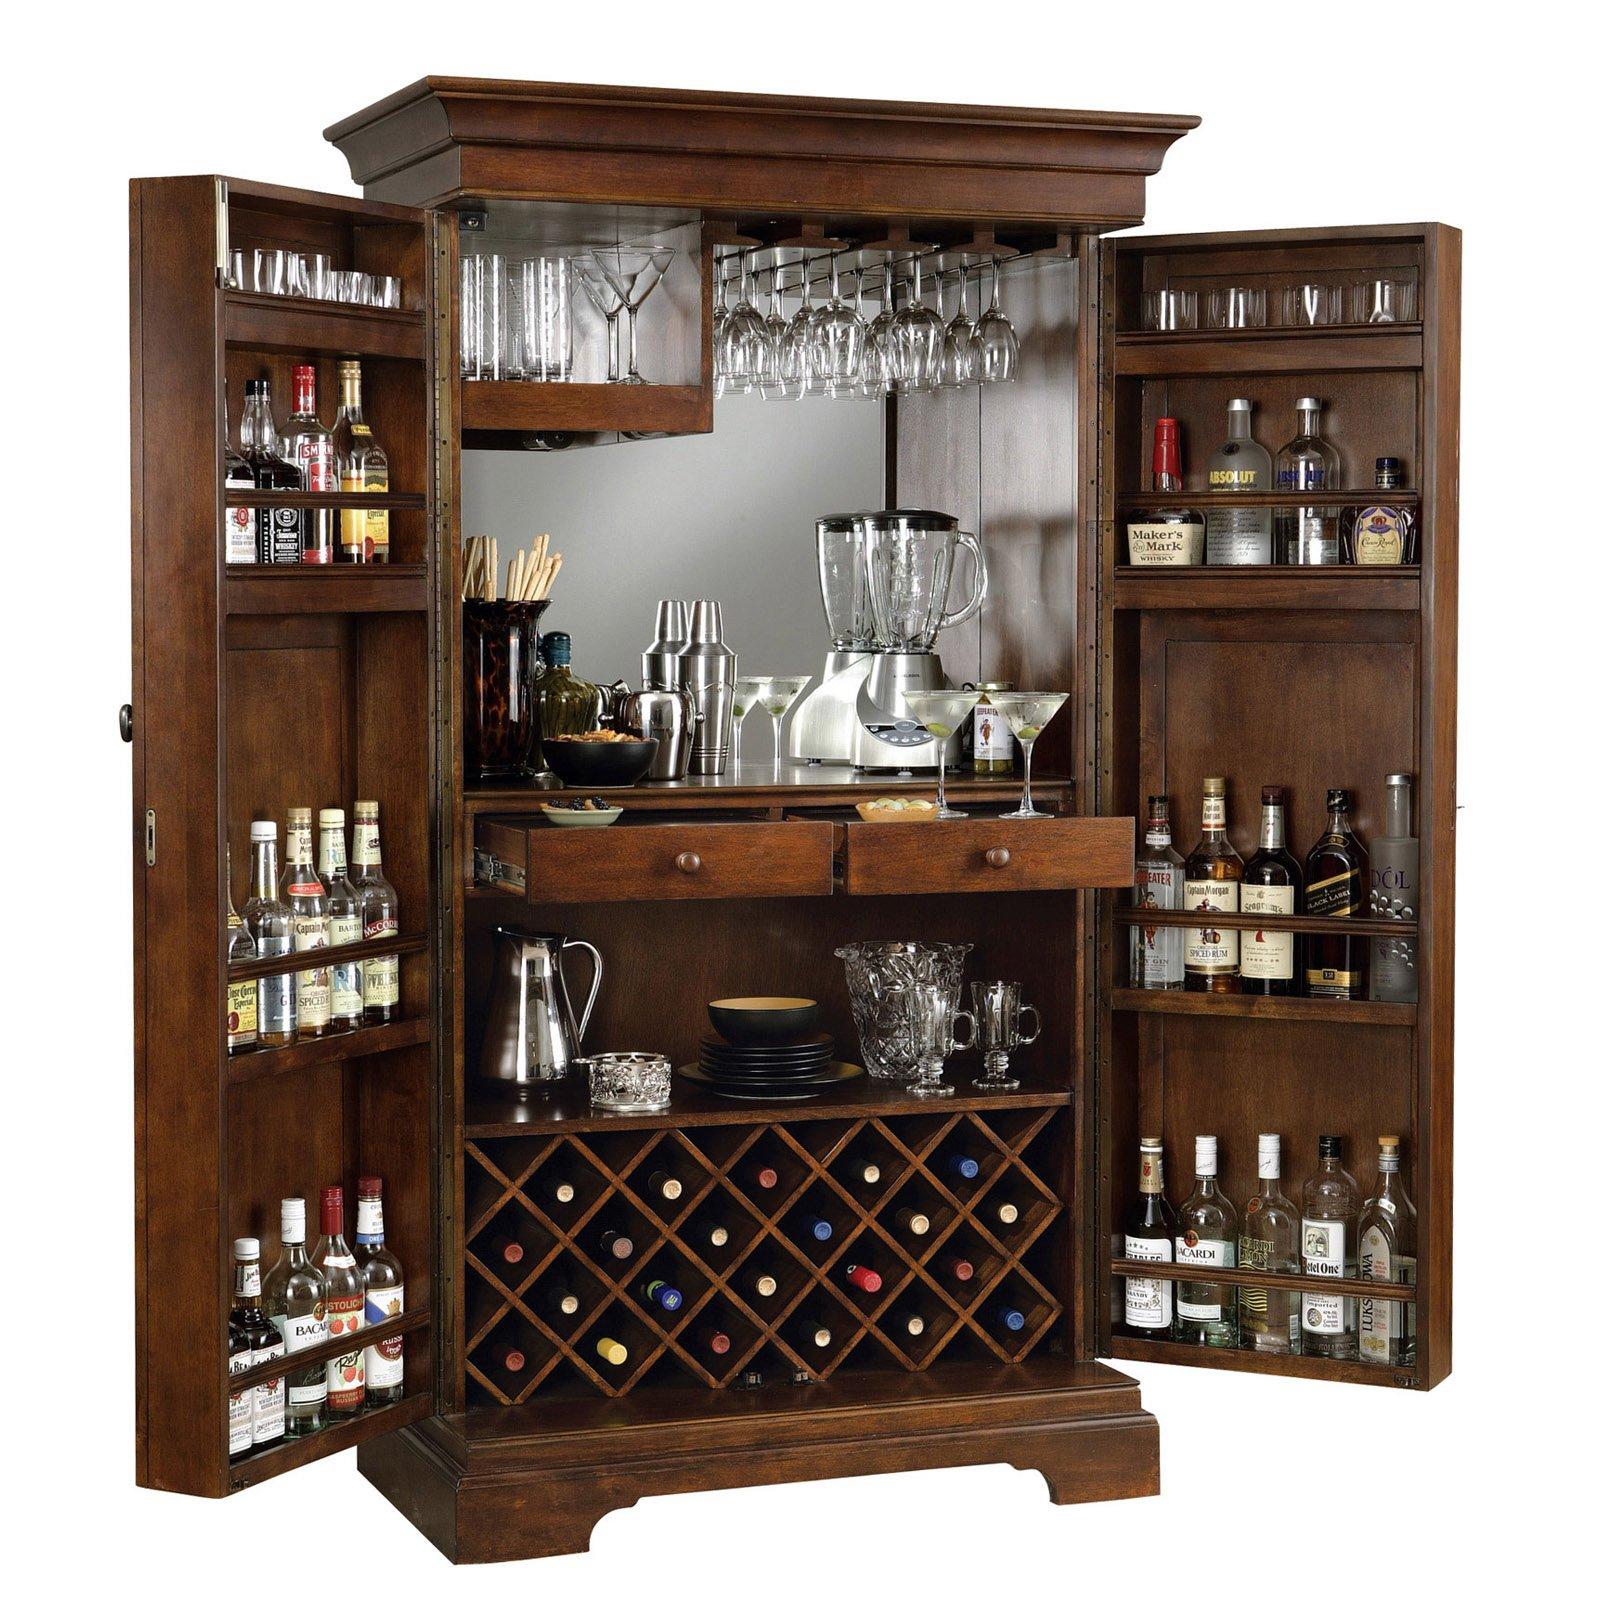 Bar Furniture Designs Impressive Design Bar Counter Furniture Design Home  Bar Furniture